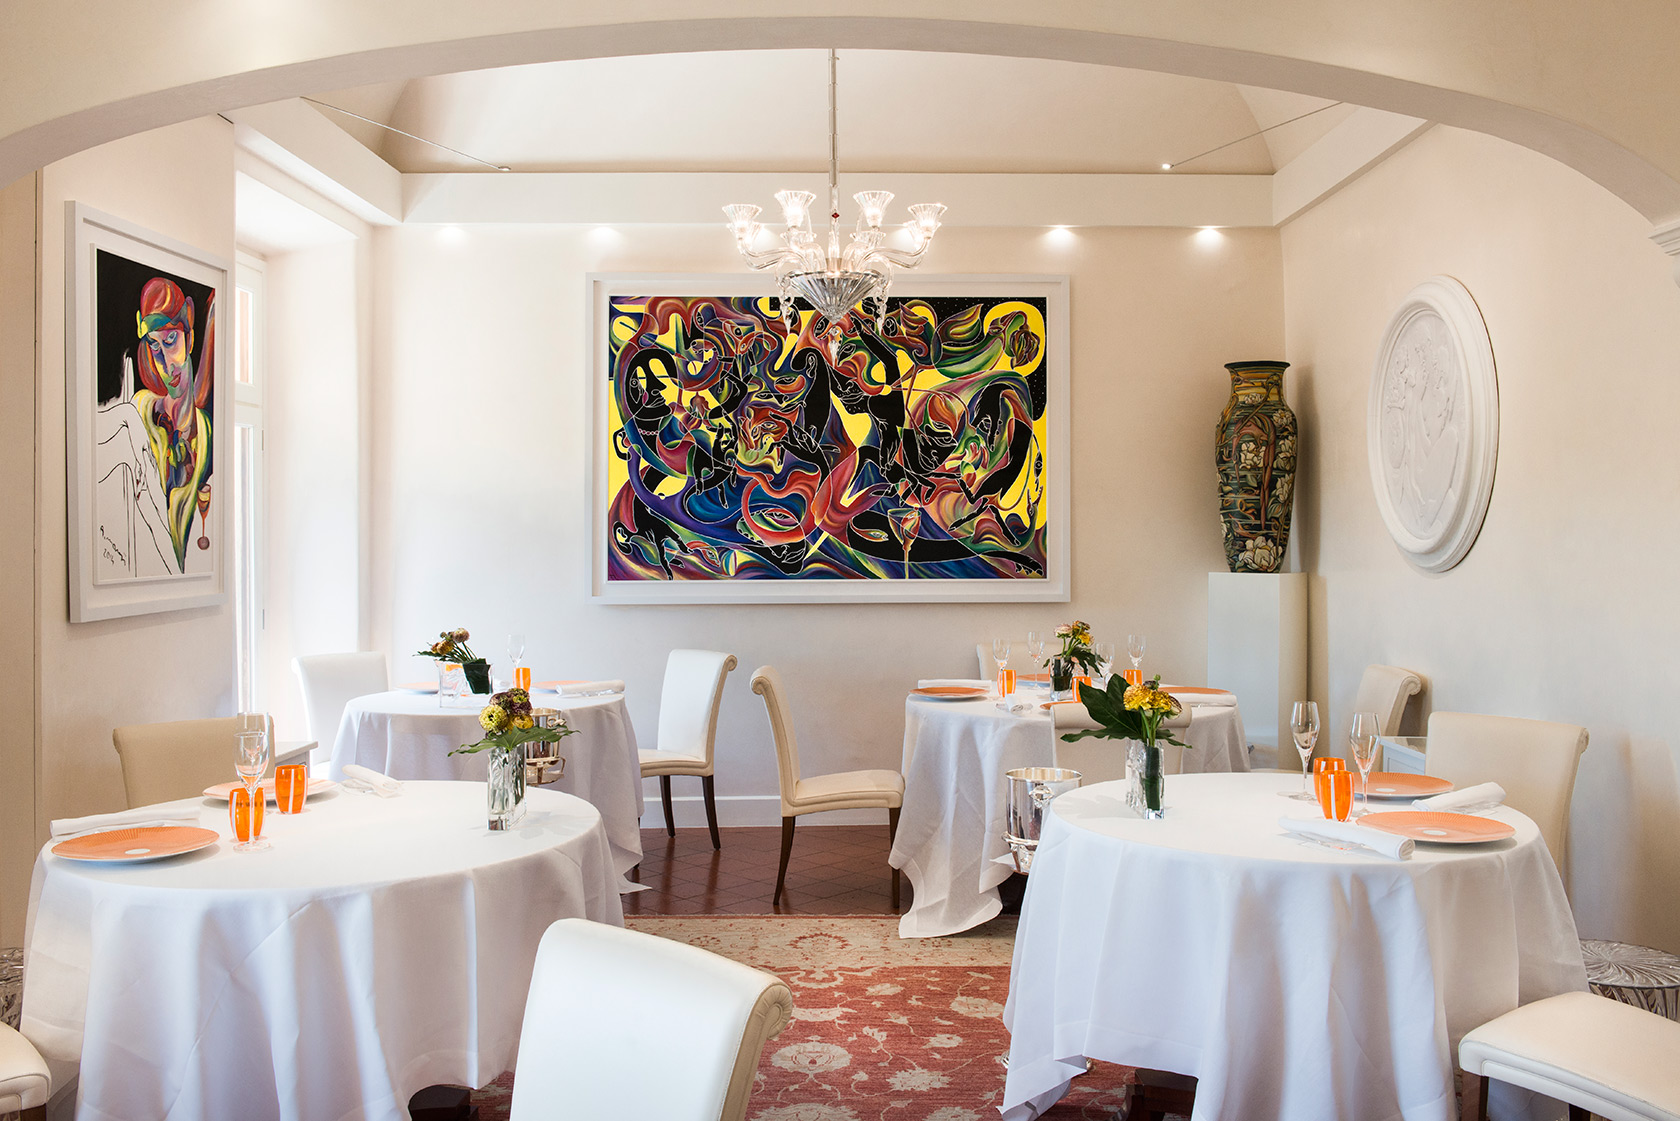 arnolfo-ristornate-sala2-grande-colle-val-delsa